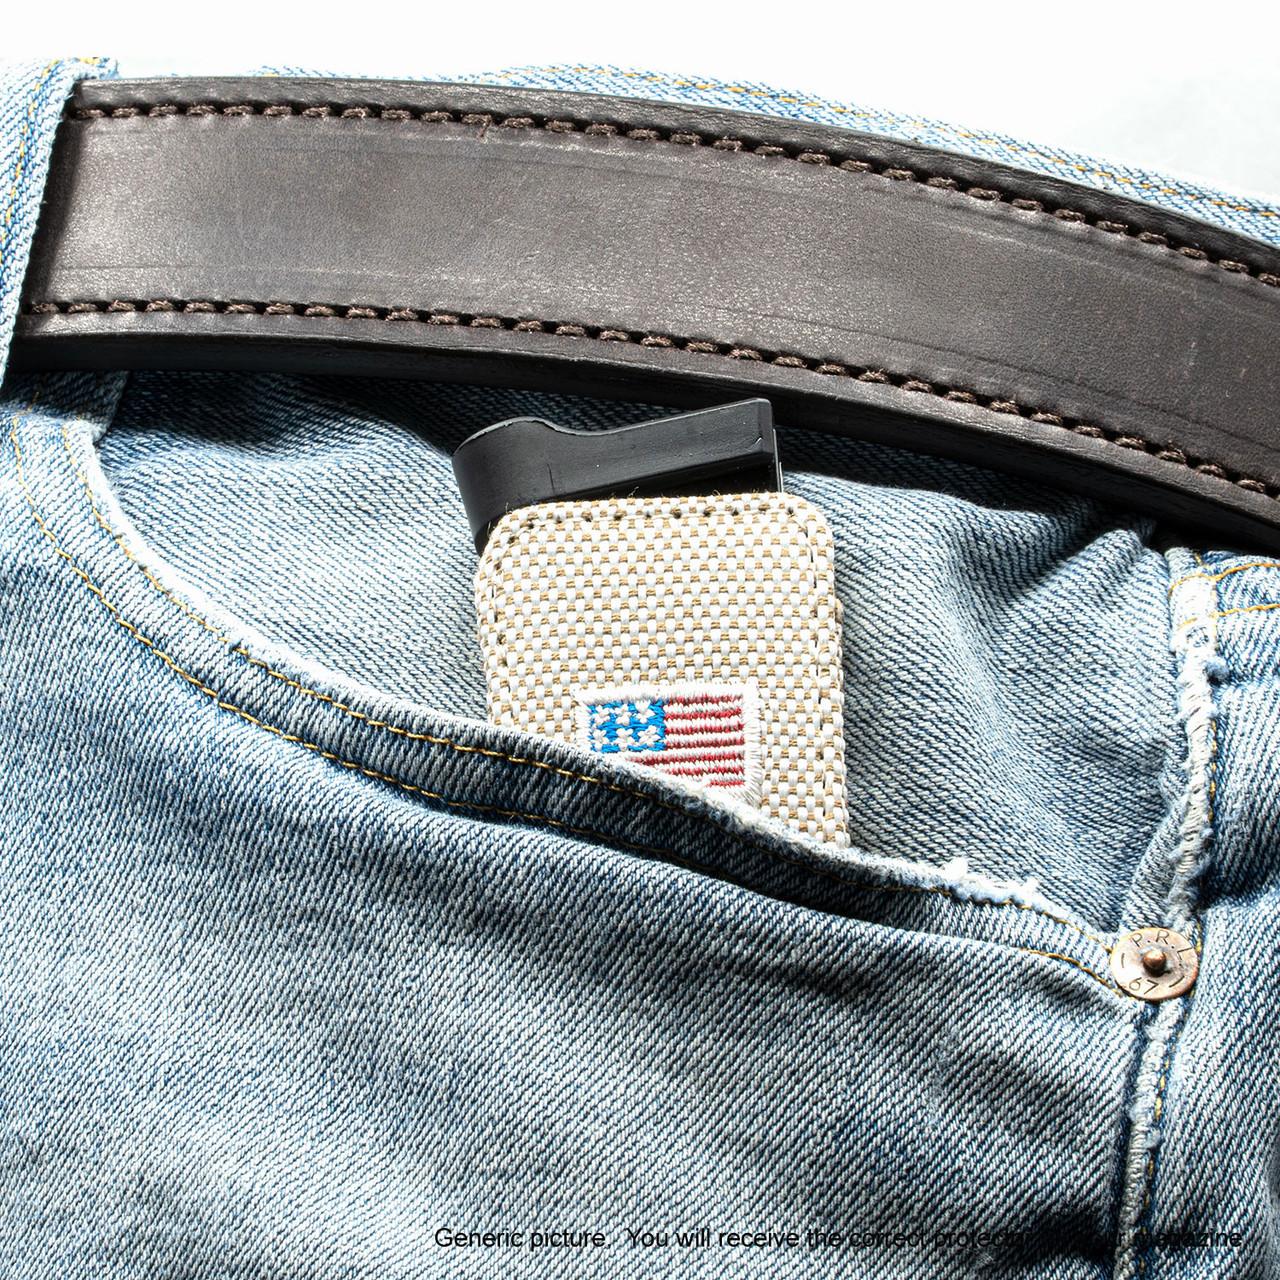 Kimber Evo Tan Canvas Flag Magazine Pocket Protector